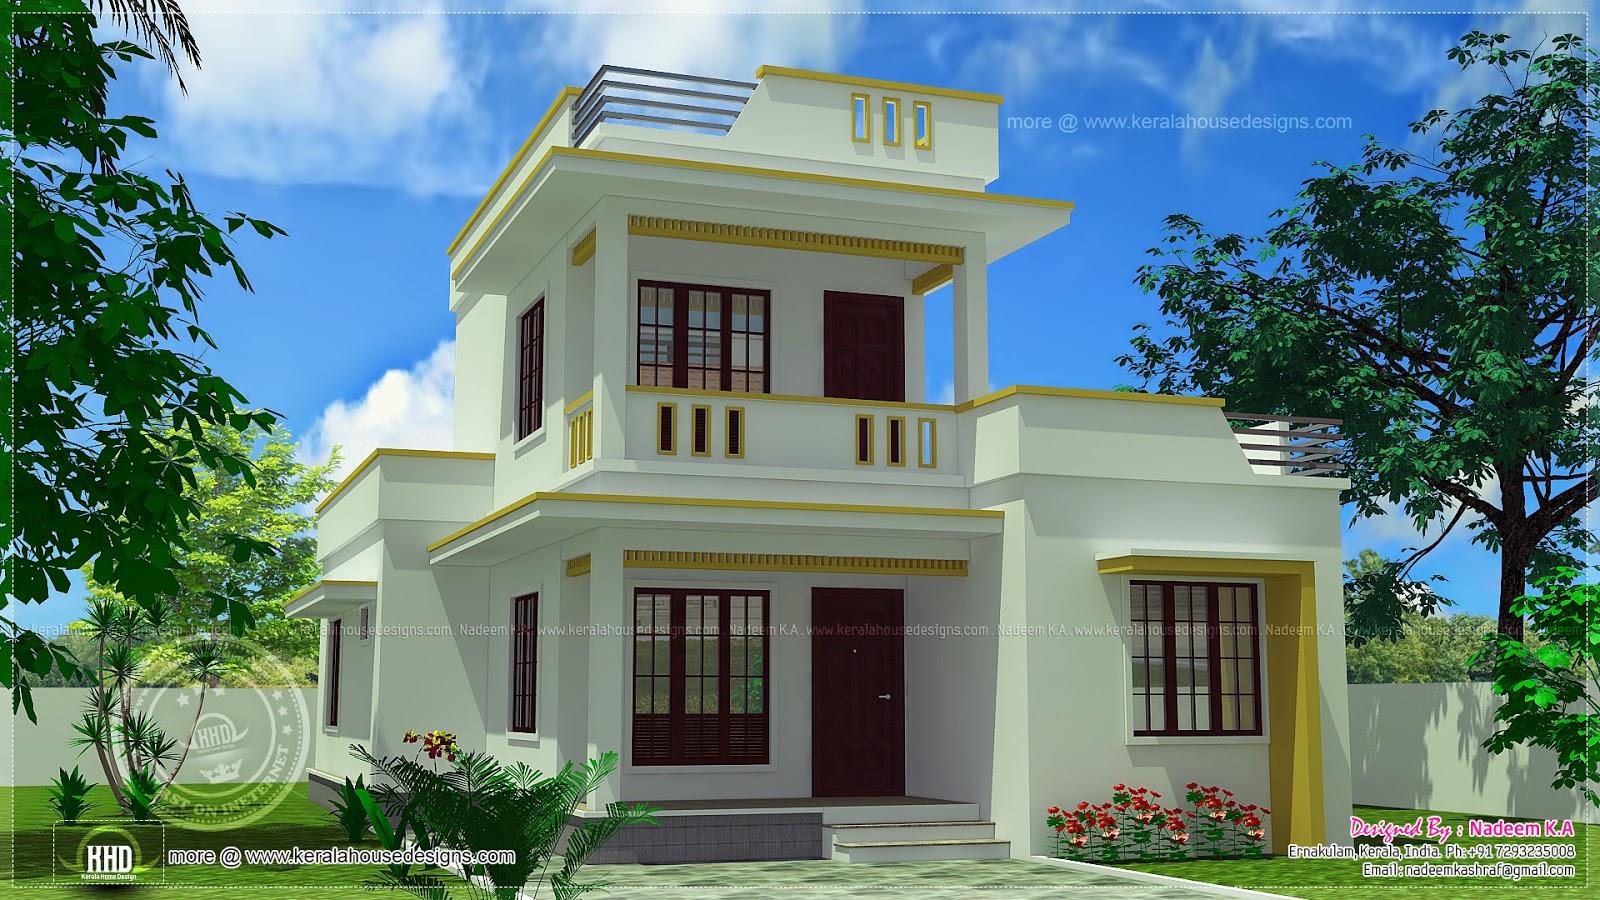 roof home design sq feet kerala home design floor plans september kerala home design floor plans